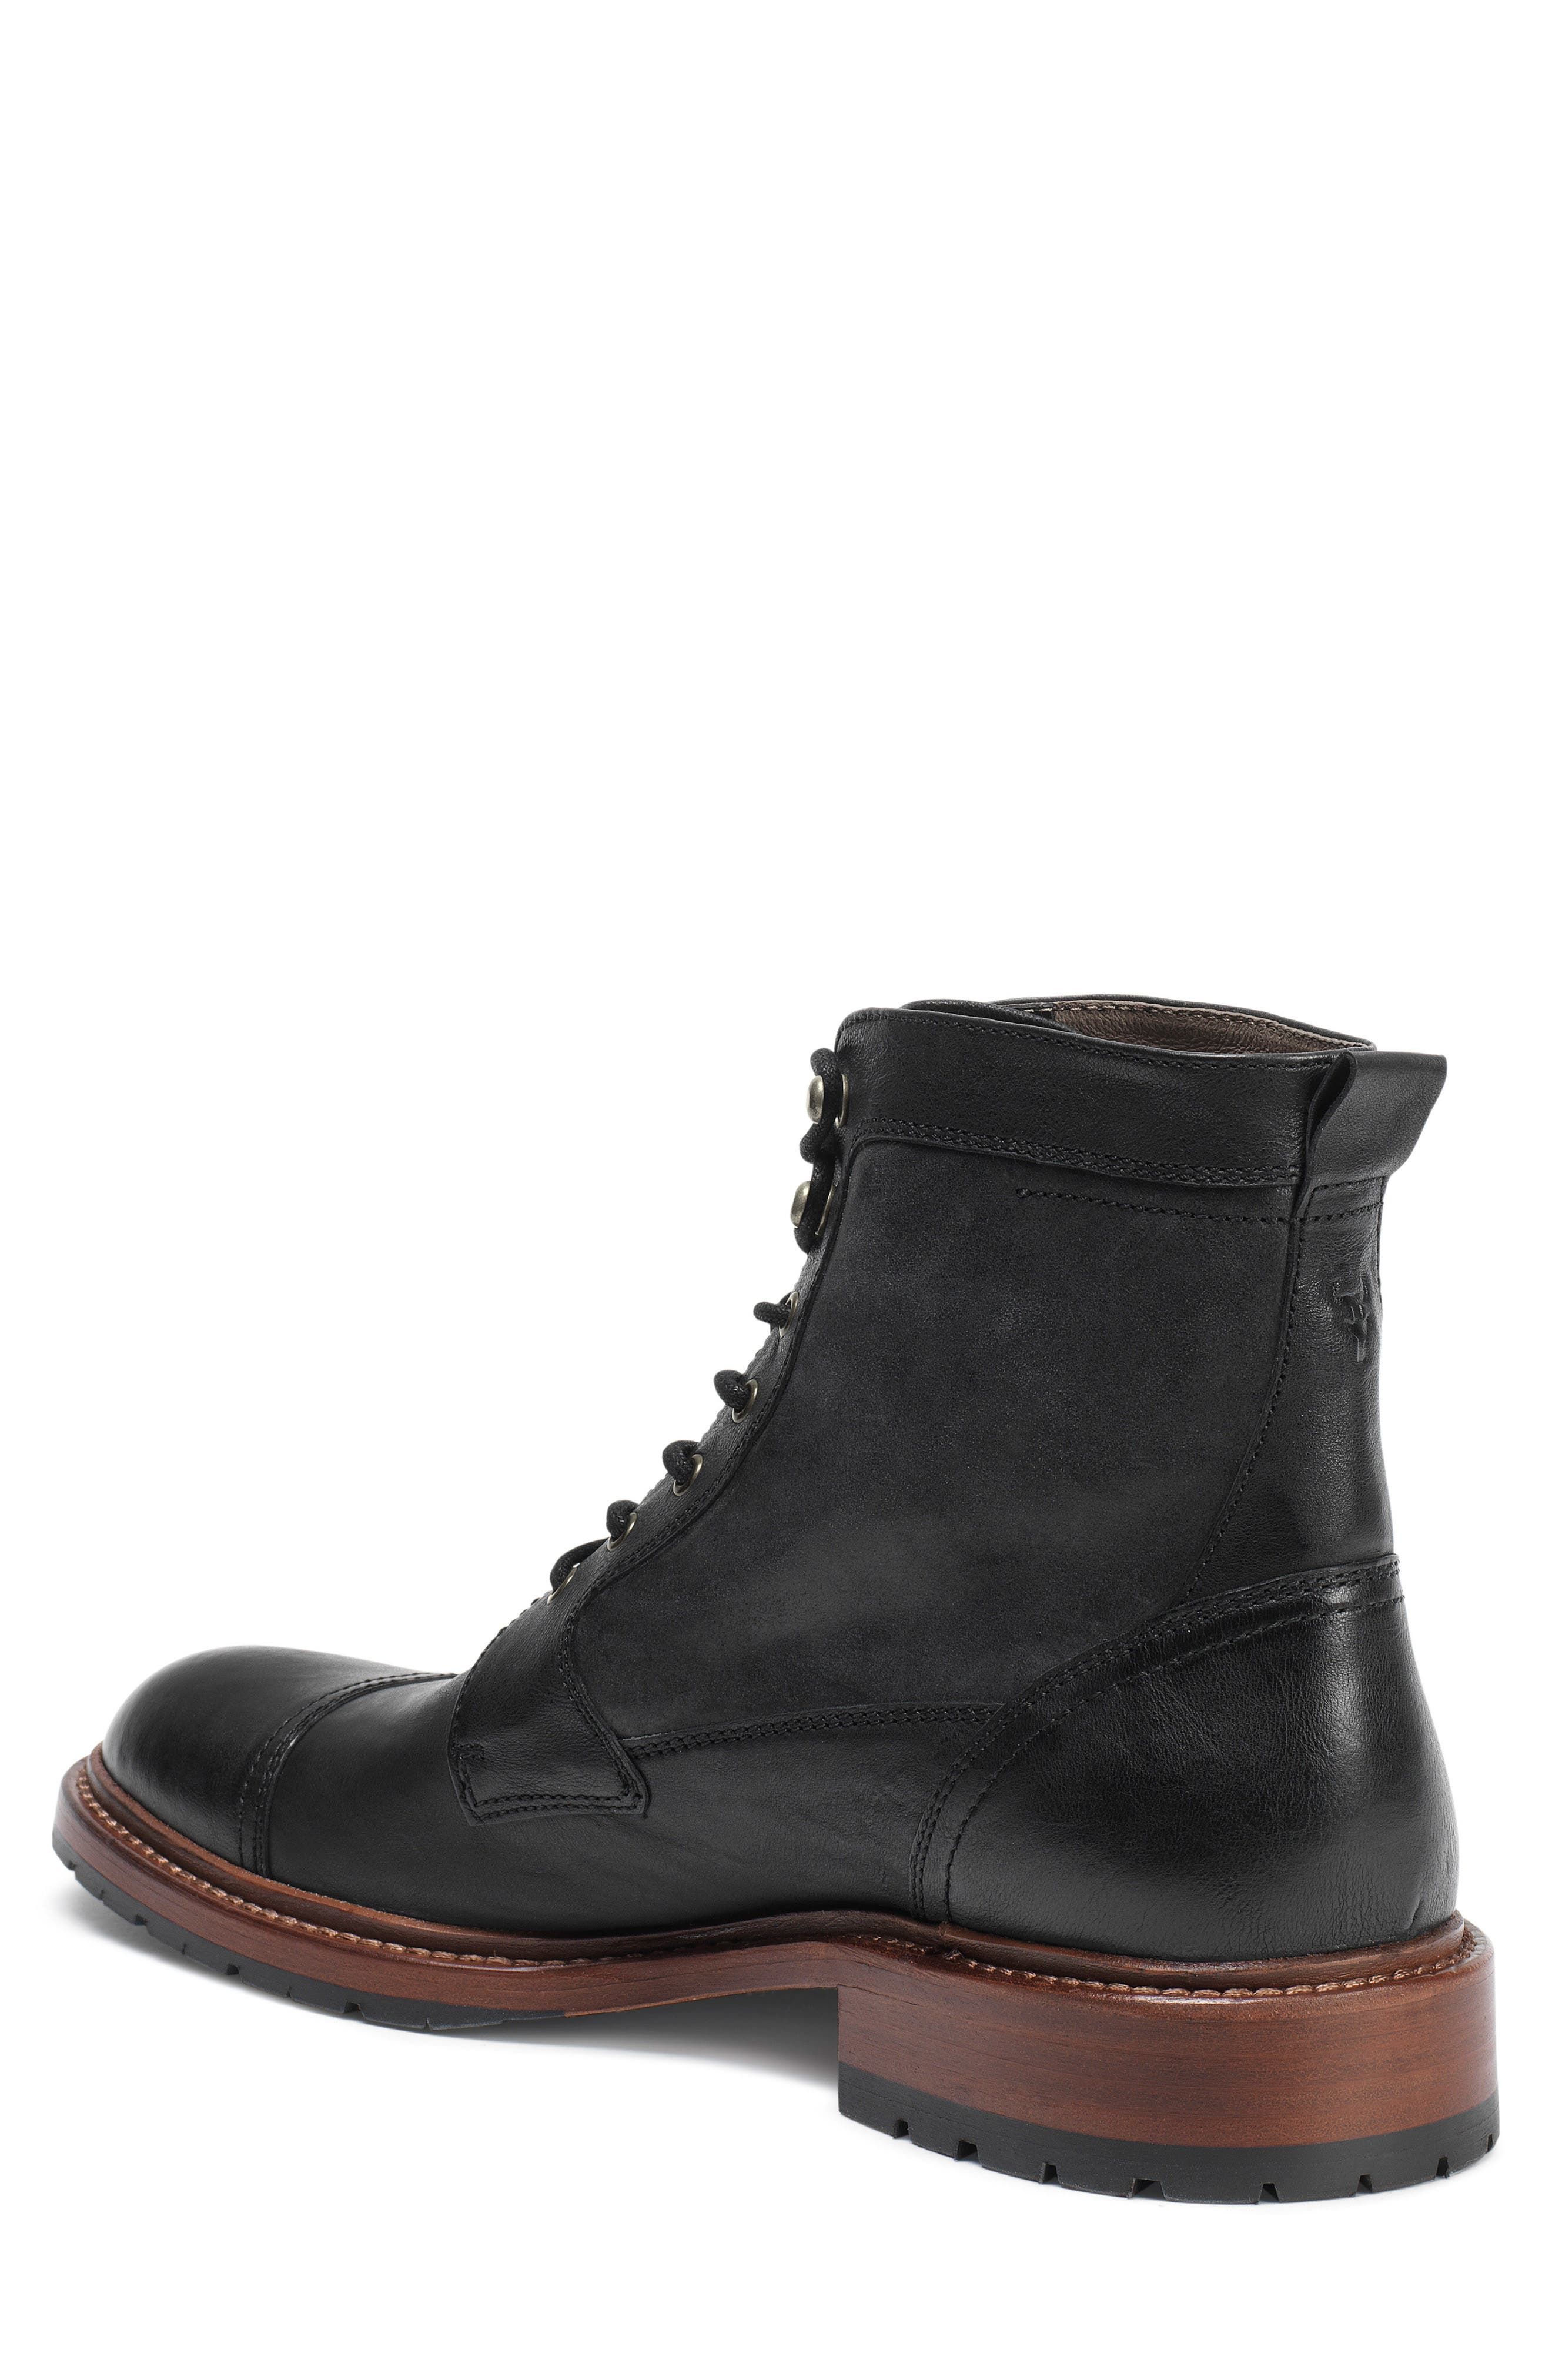 Alternate Image 2  - Trask 'Lowell' Cap Toe Boot (Men)